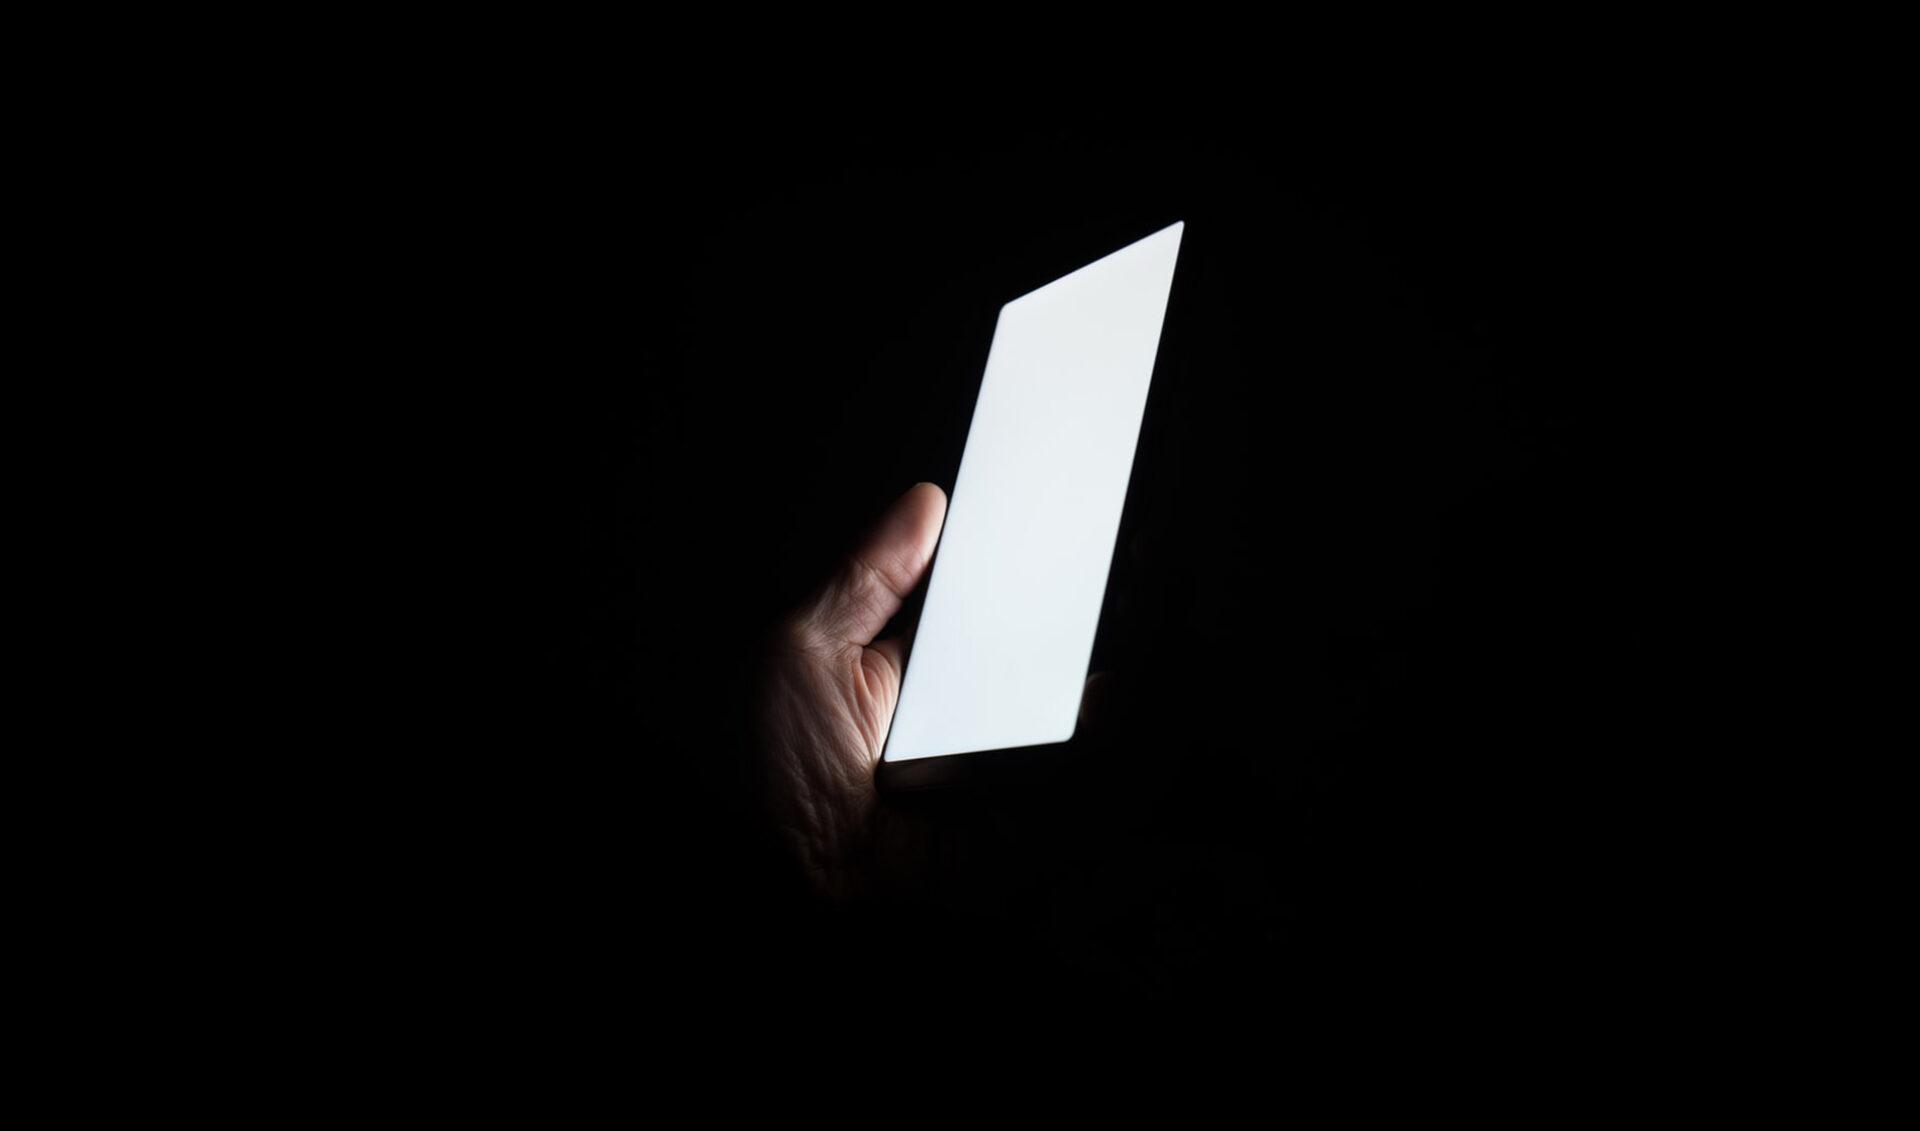 TikTok Removed 82 Million Videos, 9.6 Billion Fake Likes Between April And June